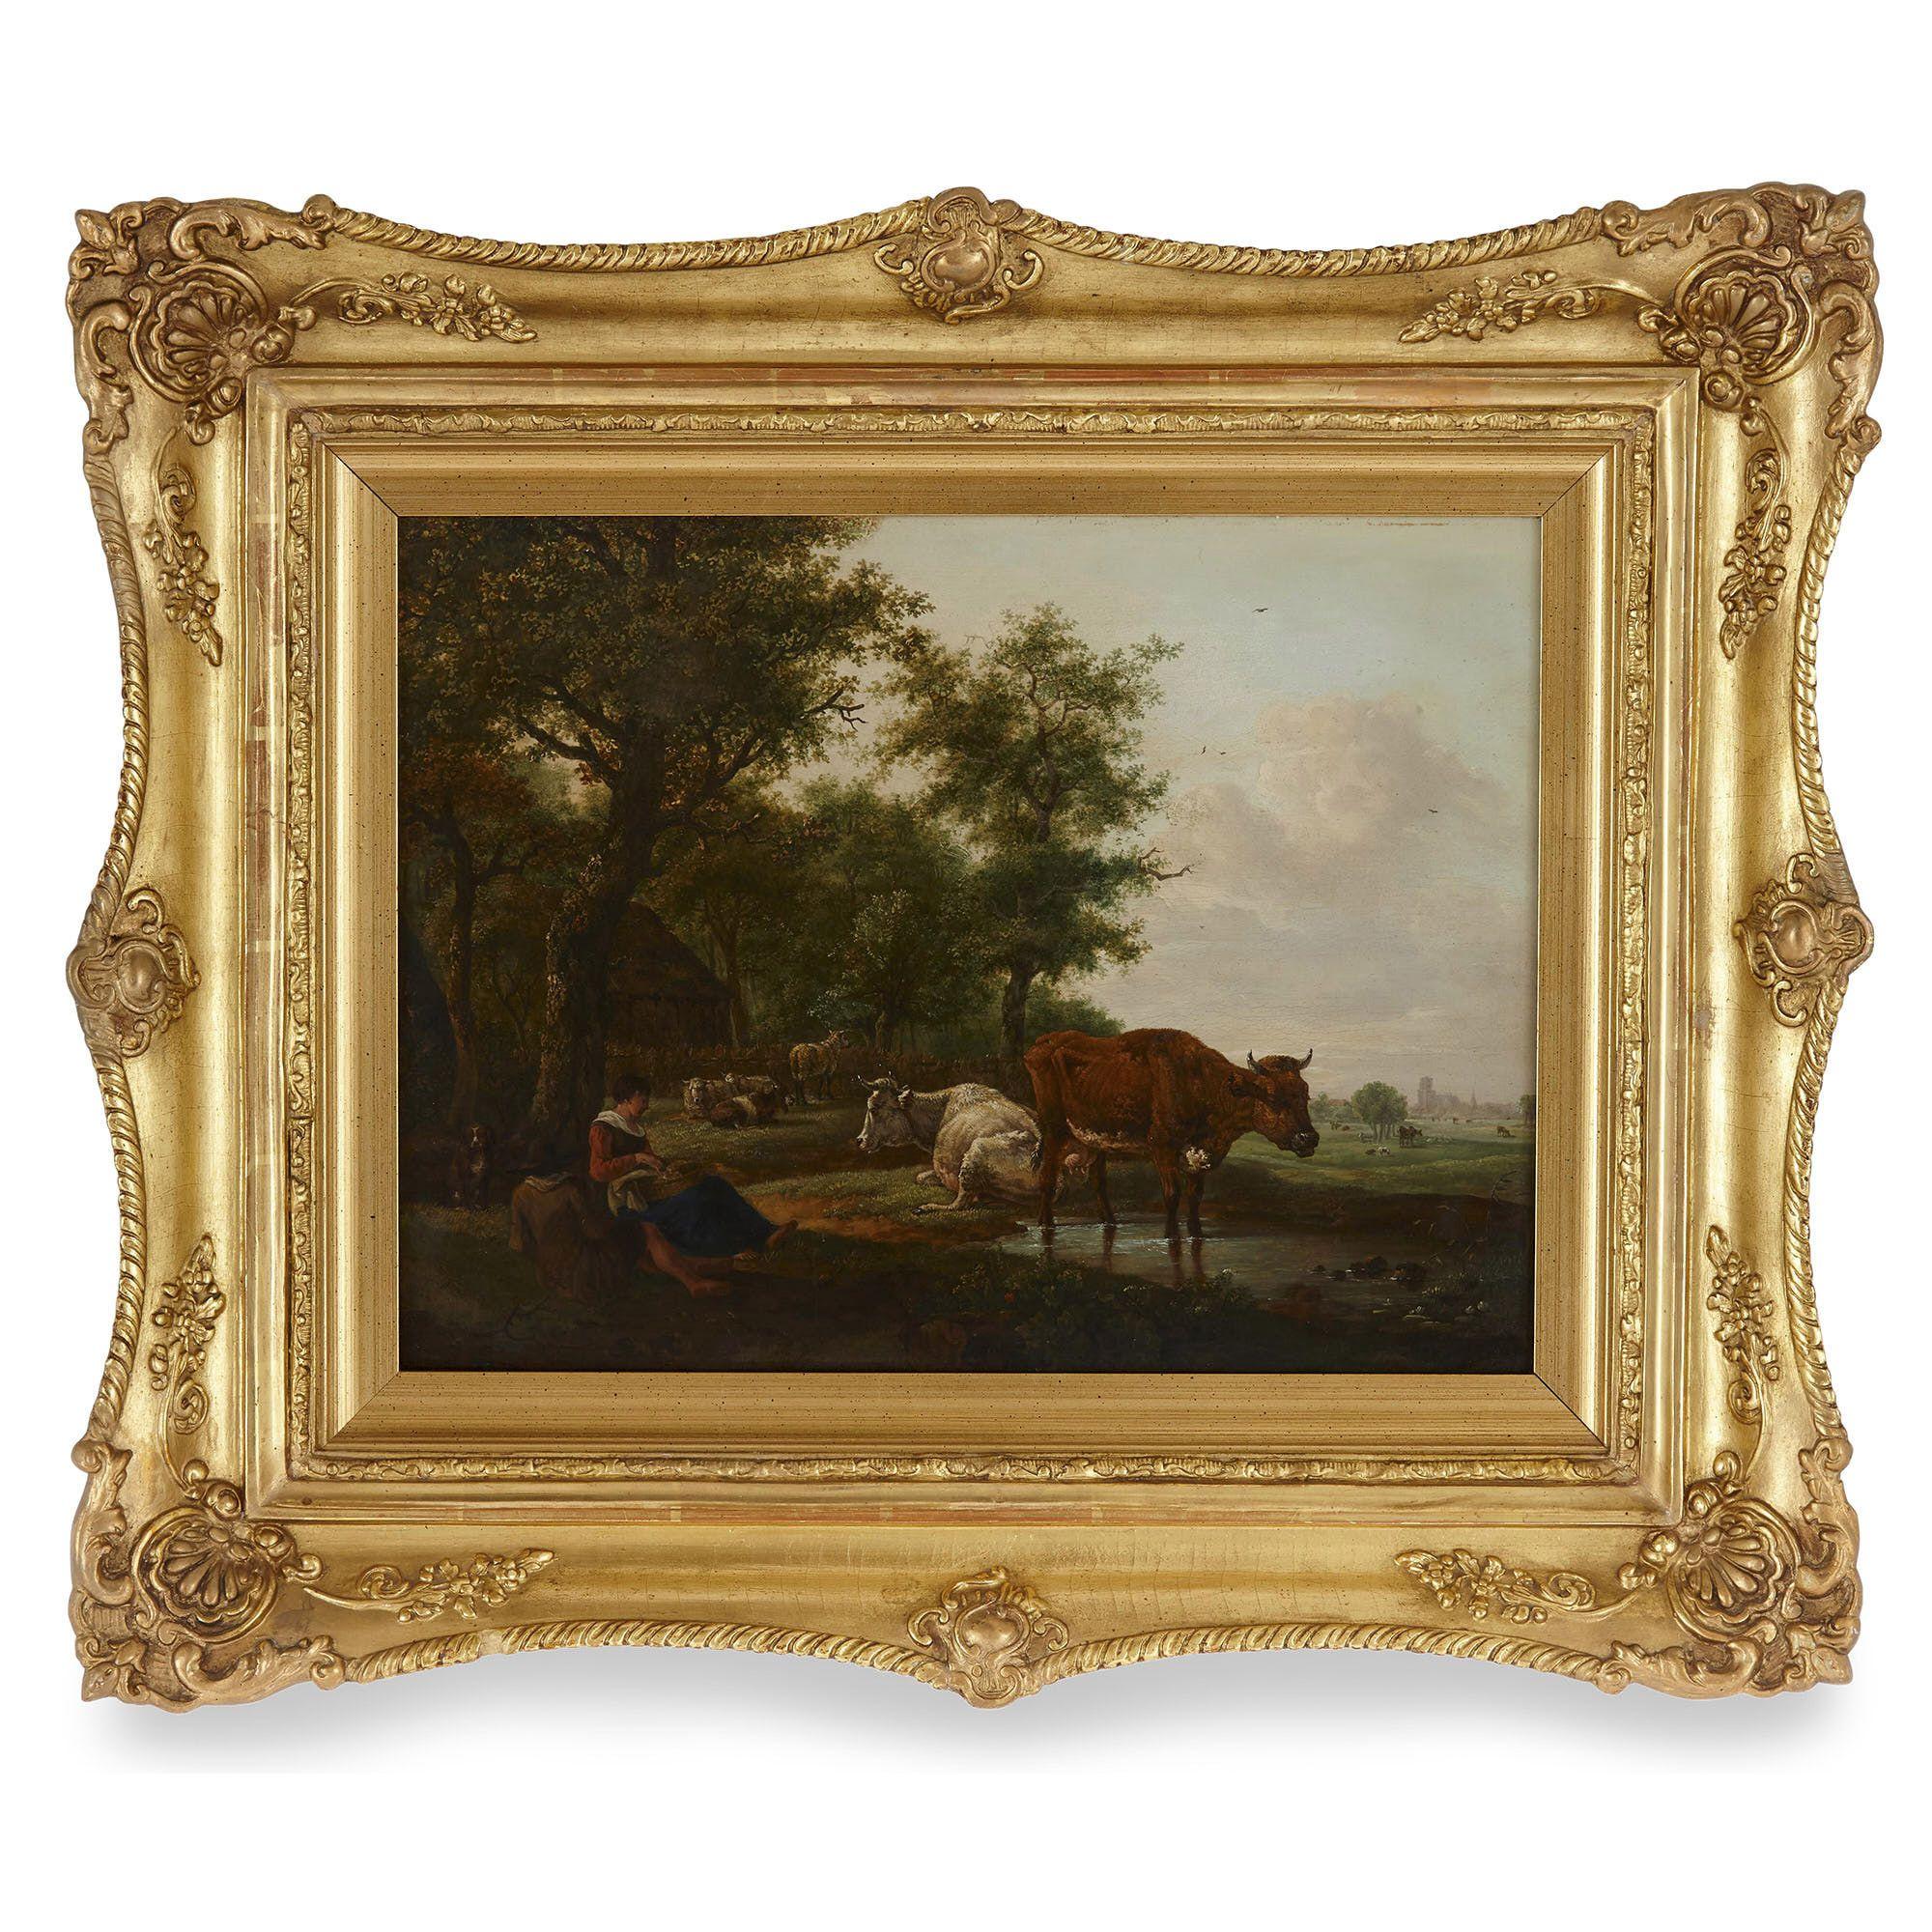 Masterpiece: Dutch School Old Master Pastoral Landscape Oil Painting